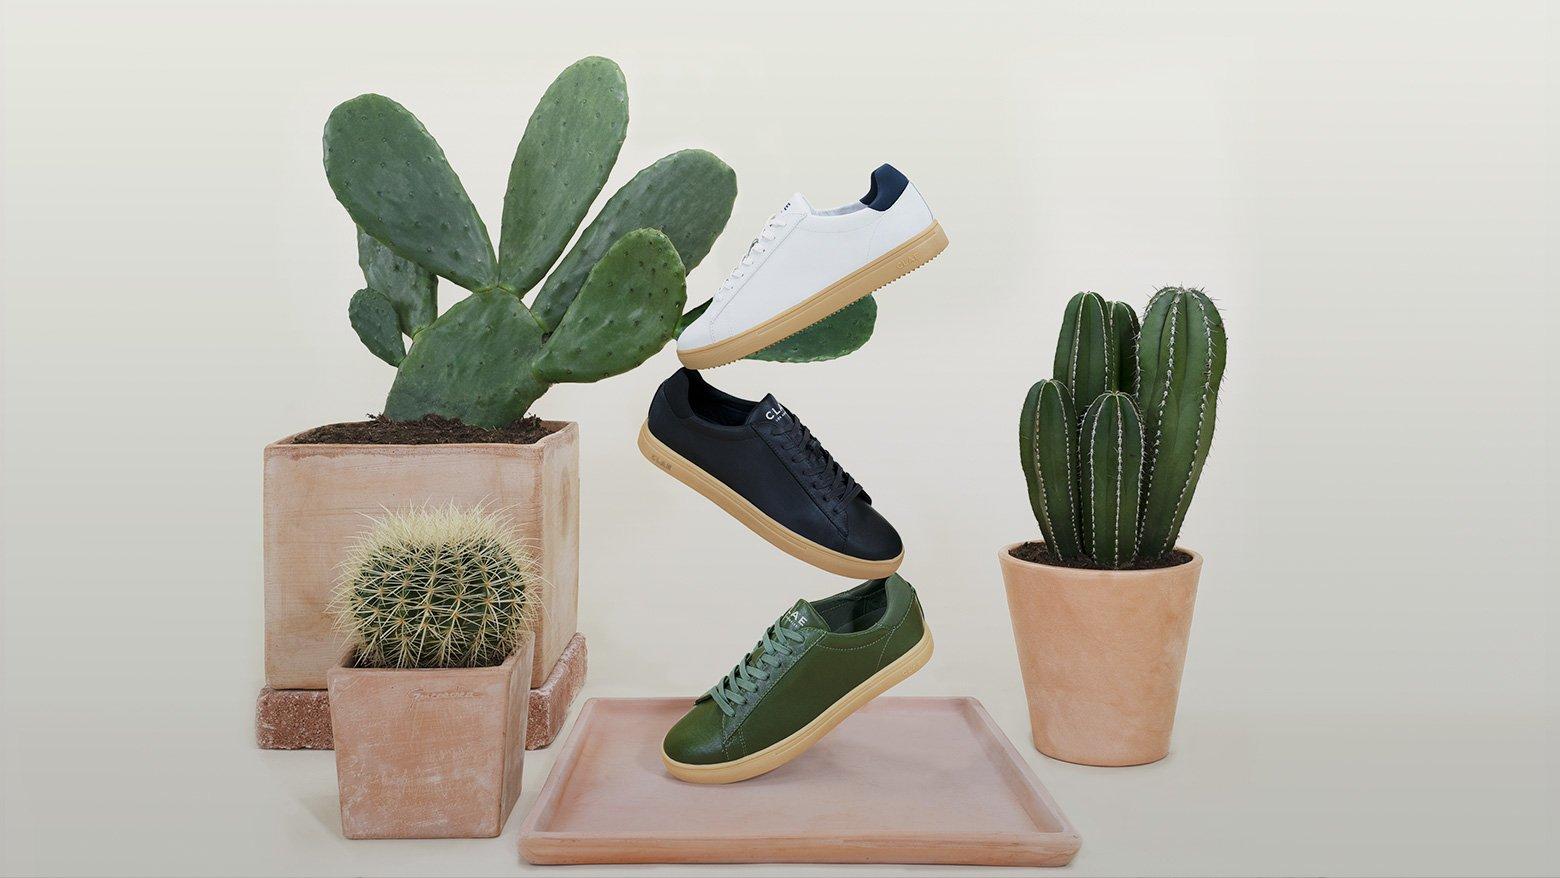 kaktuszbőr sneaker